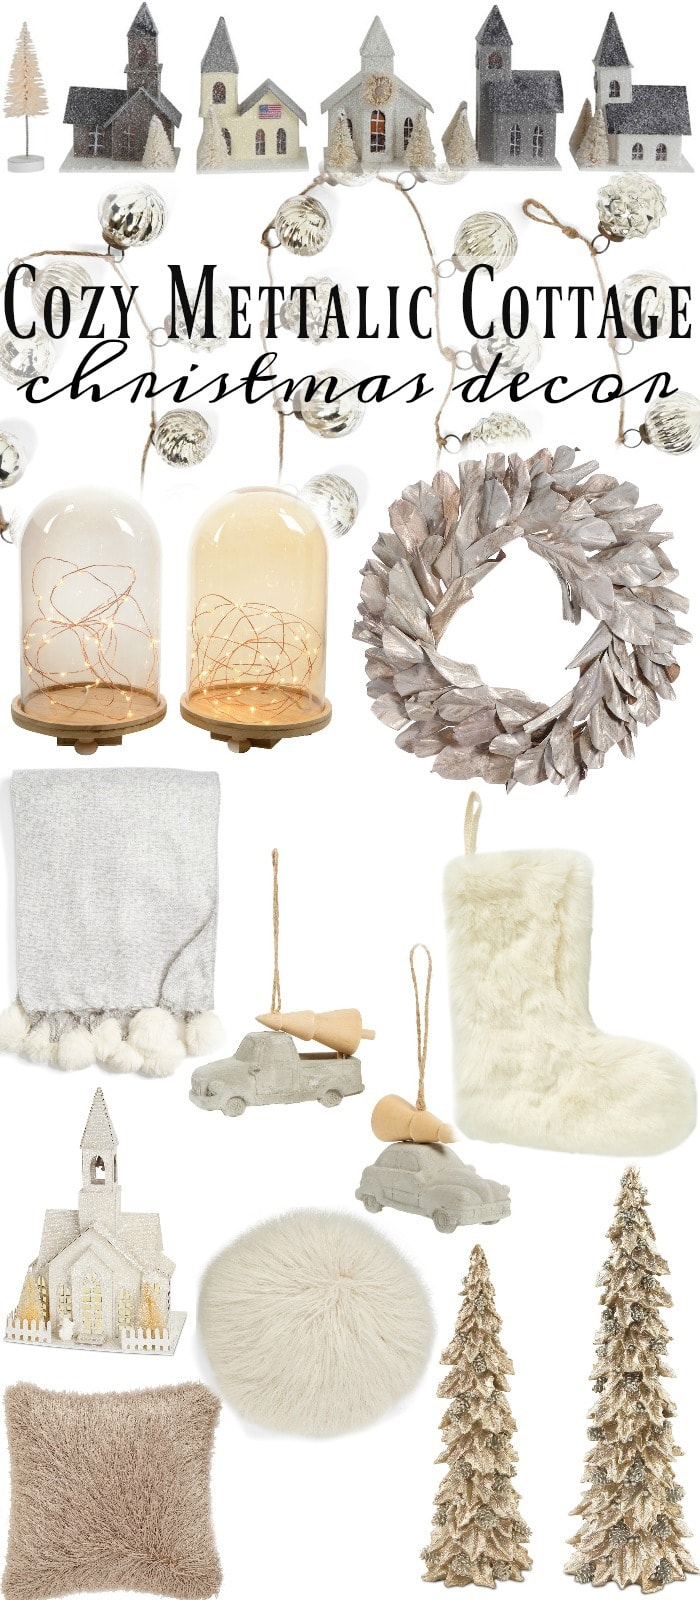 Cozy Metallic Cottage Christmas Decor